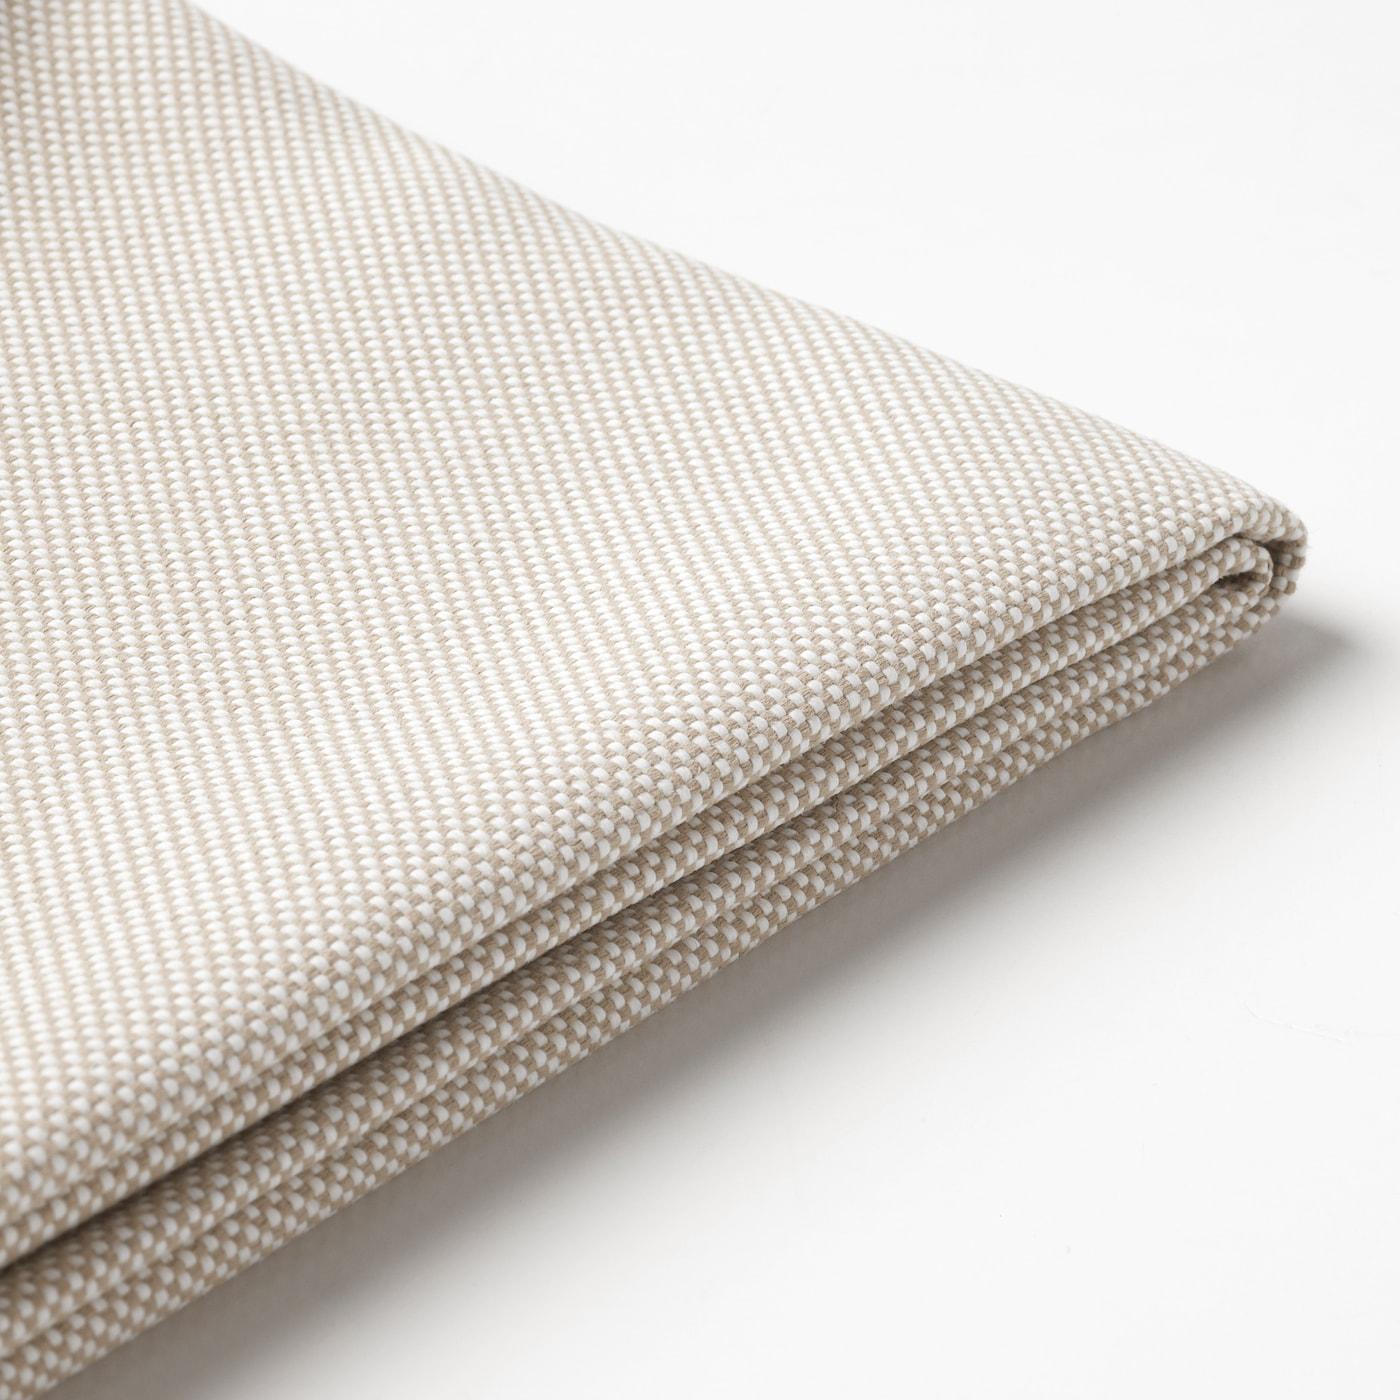 FRÖSÖN غطاء وسادة مقعد/ظهر, خارجي بيج, 116x45 سم